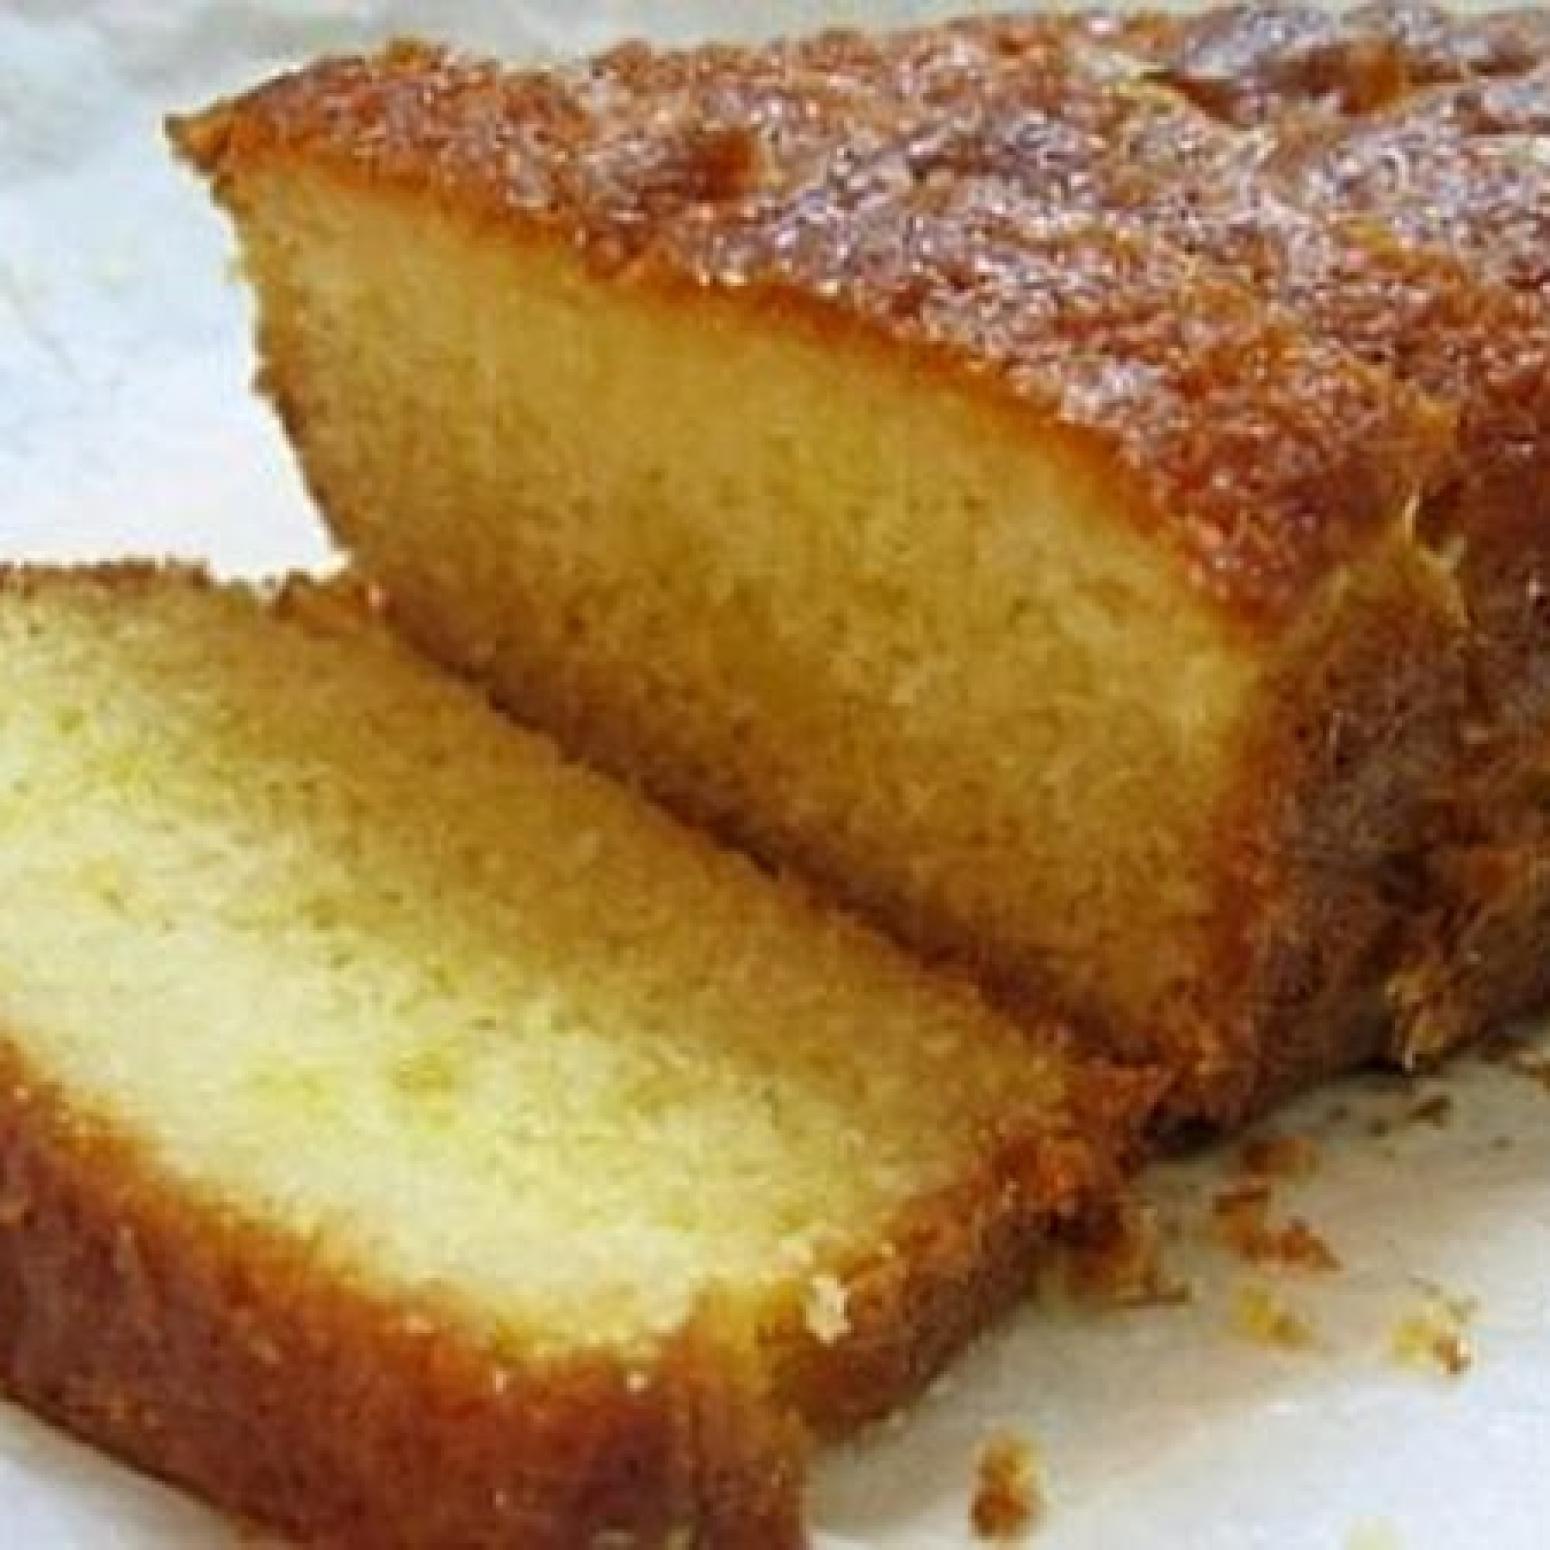 Glazed Lemon Bread Recipe 2 | Just A Pinch Recipes